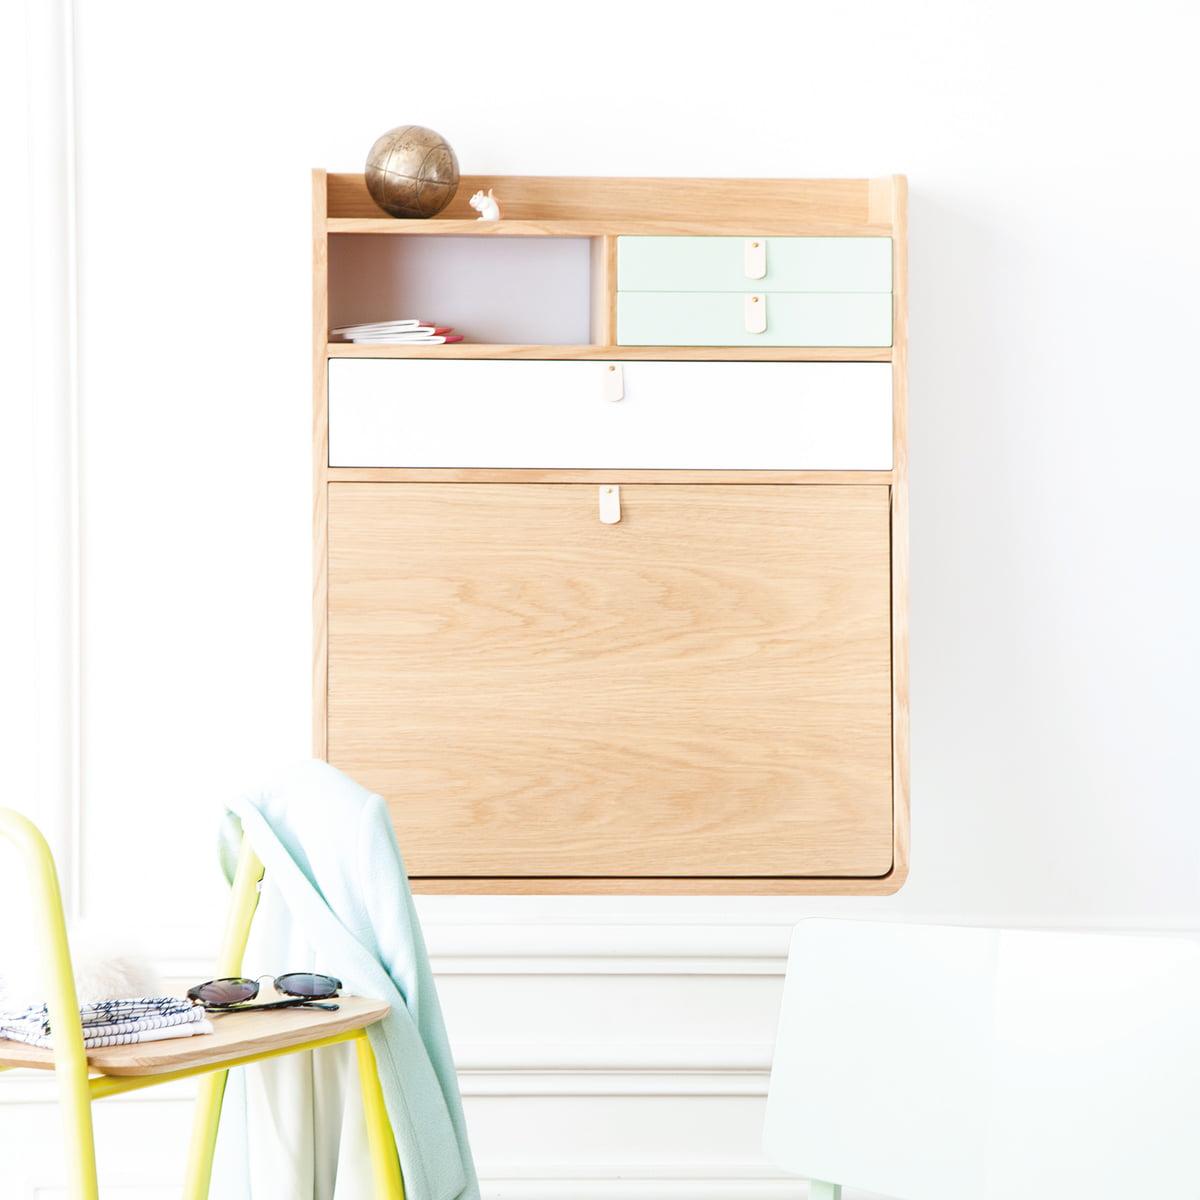 secr taire mural gaston de hart. Black Bedroom Furniture Sets. Home Design Ideas